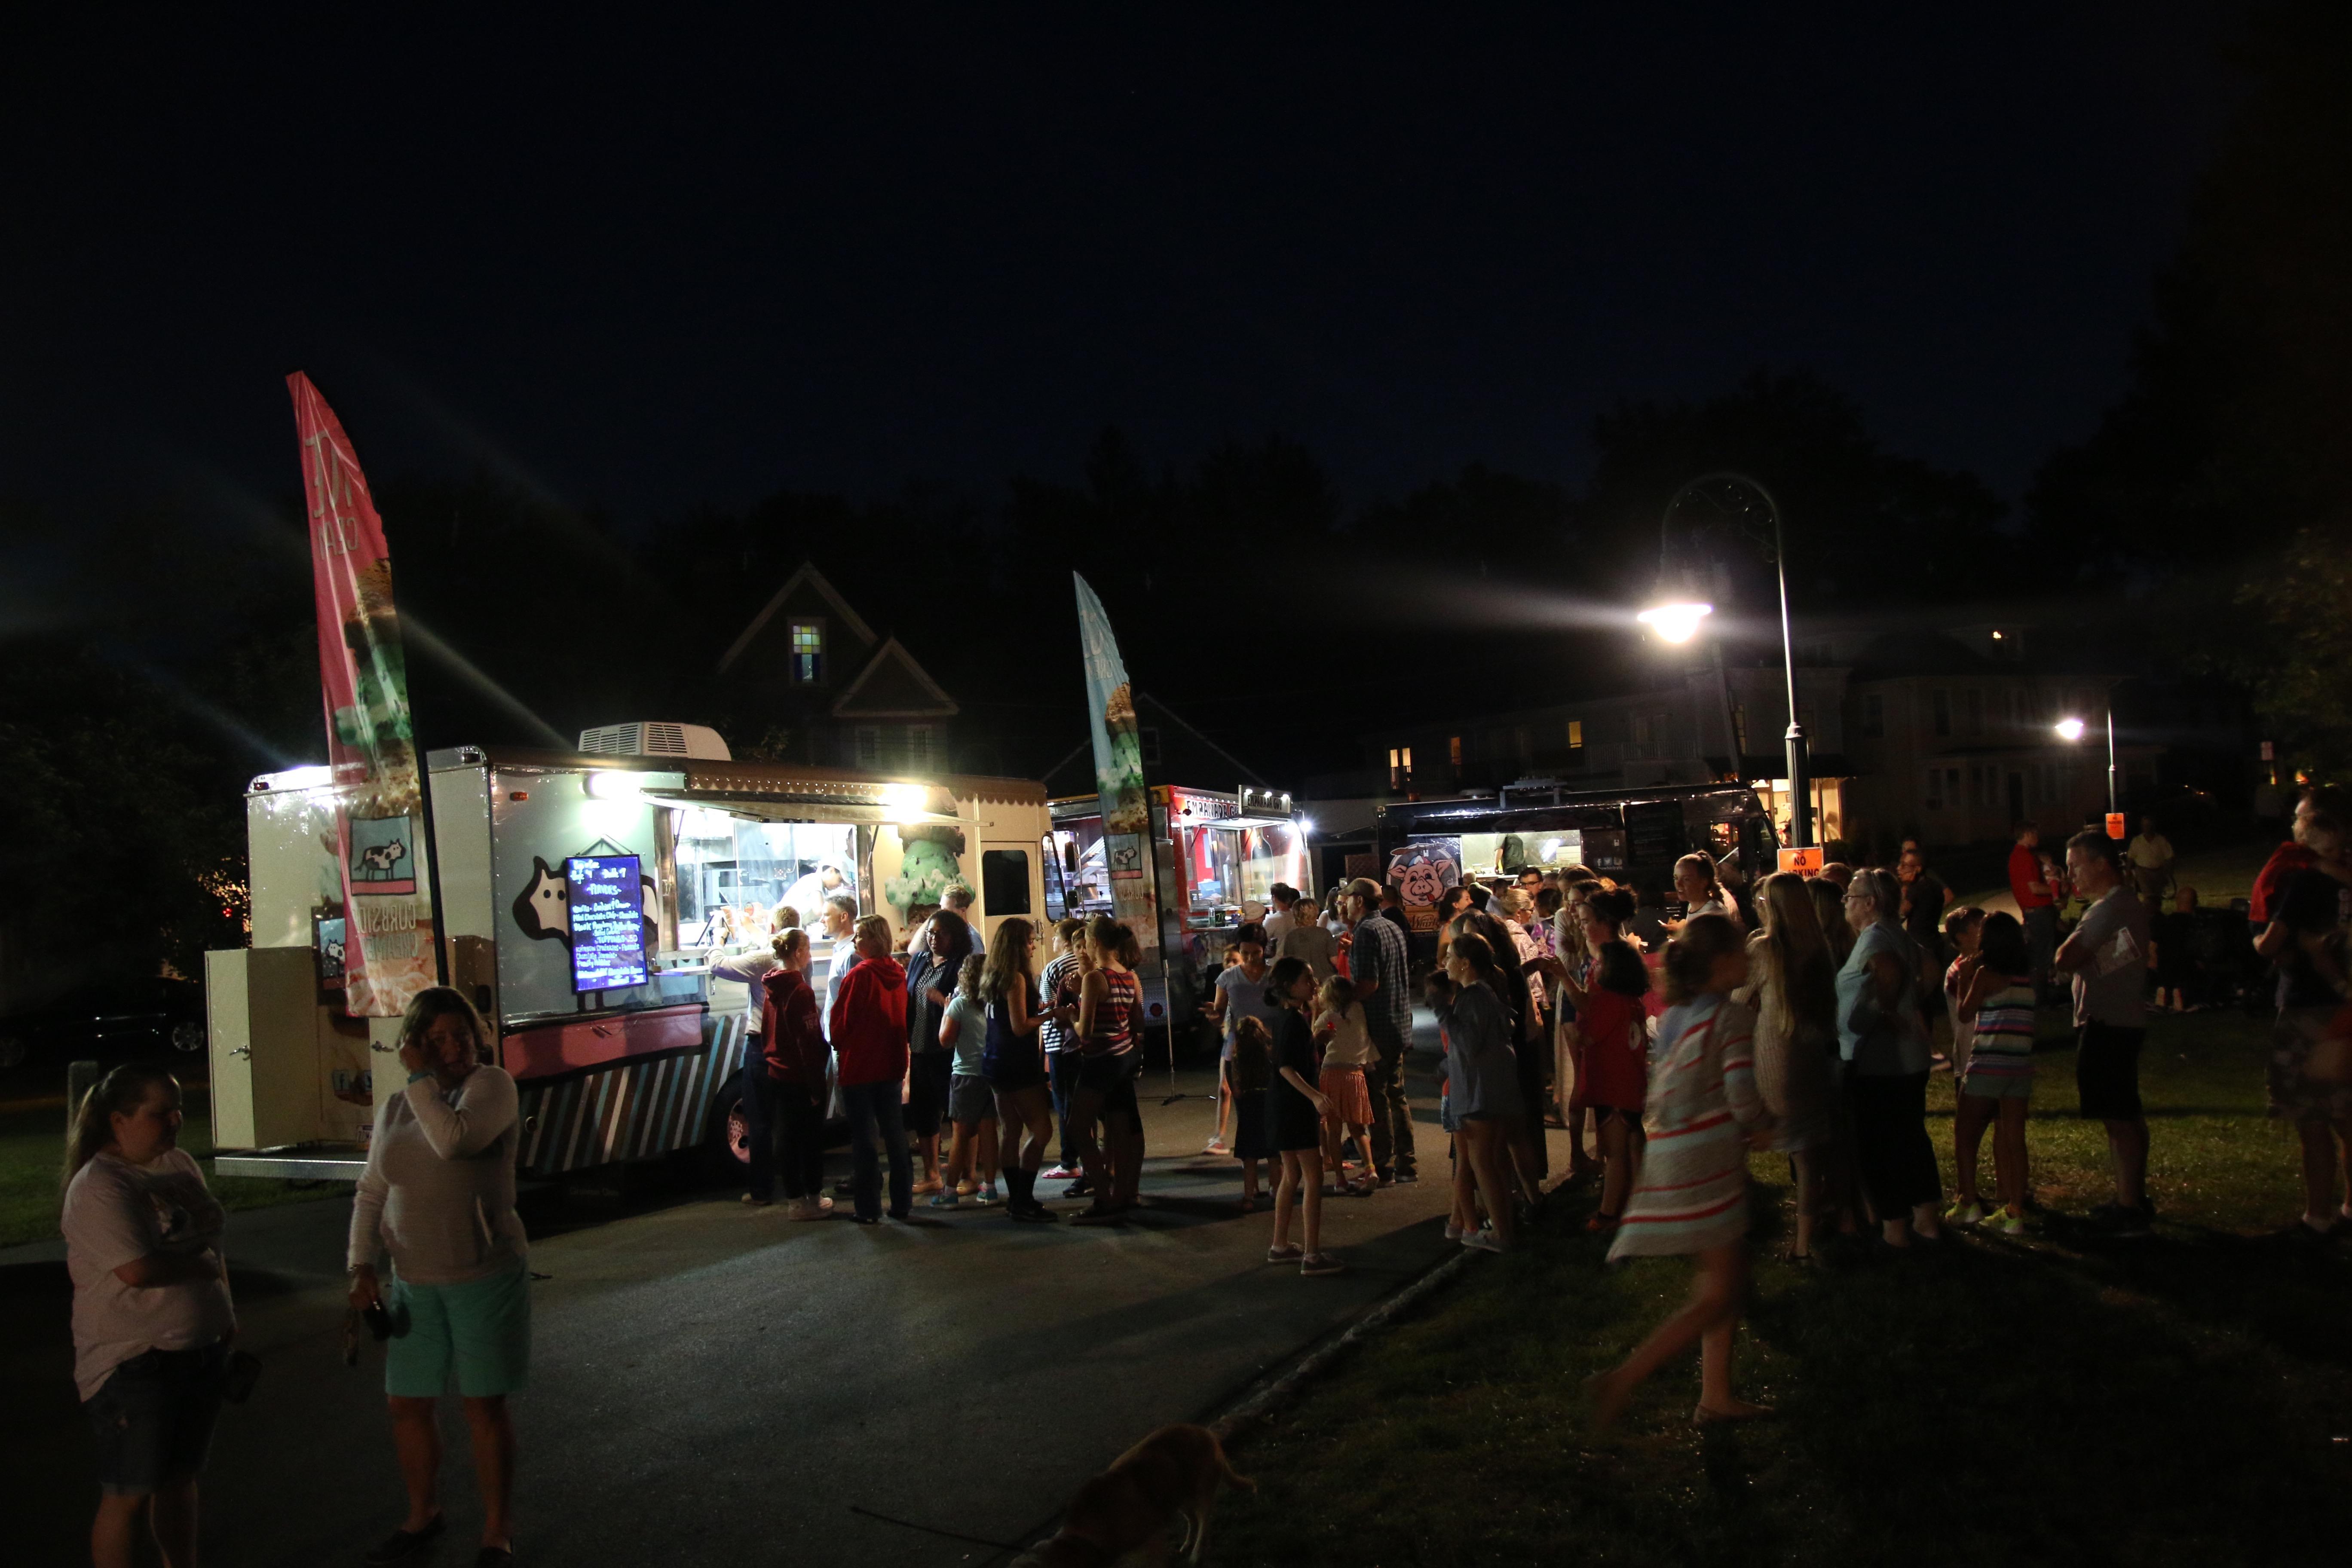 Food Truck Friday, Neighborhood Fun and Fabulous Food (Photos)